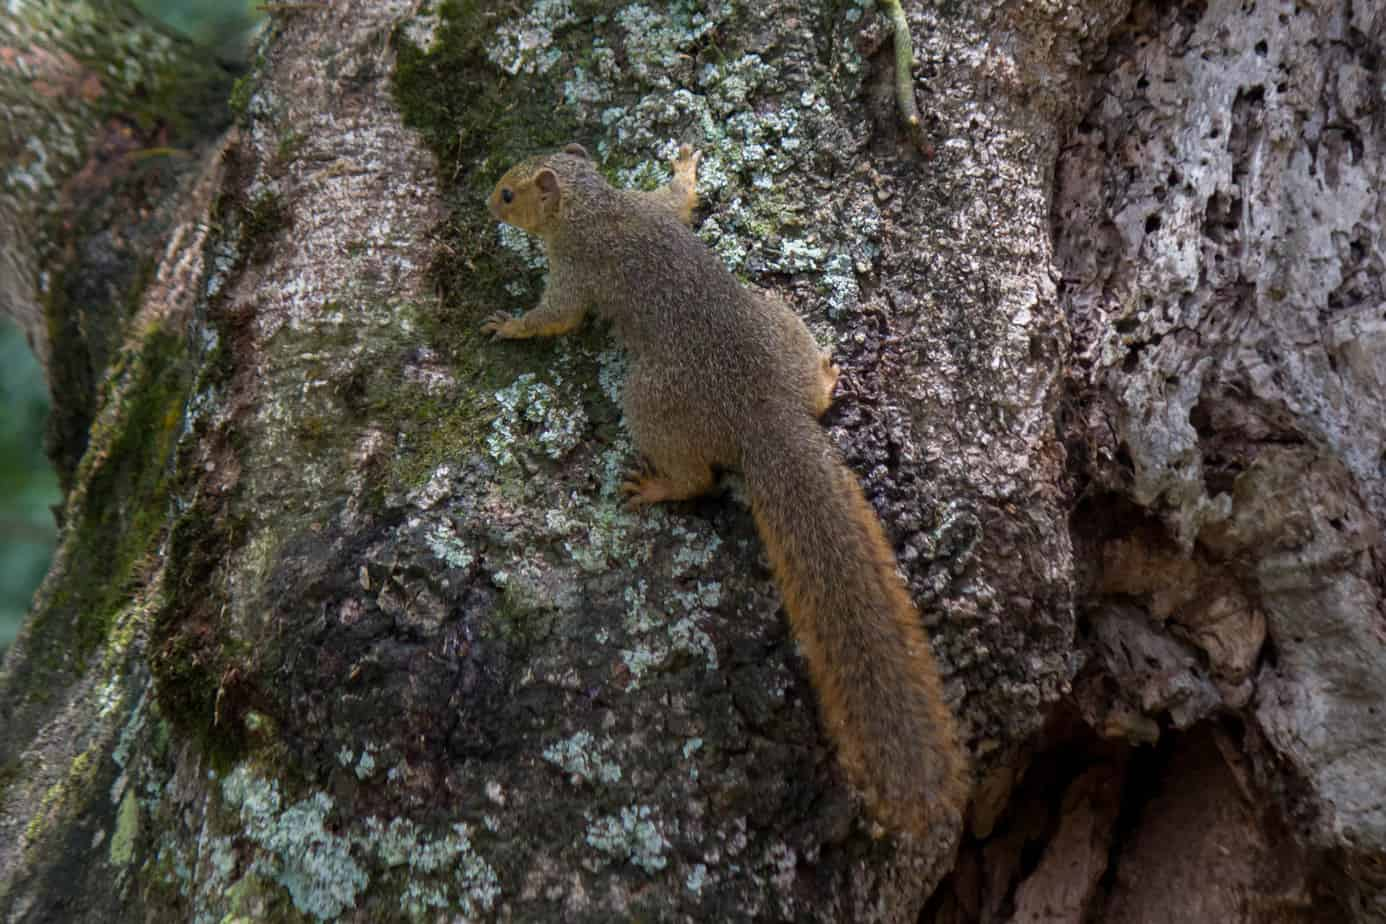 Red Bush Squirrel @ St Lucia Estuary, South Africa. Photo: Håvard Rosenlund